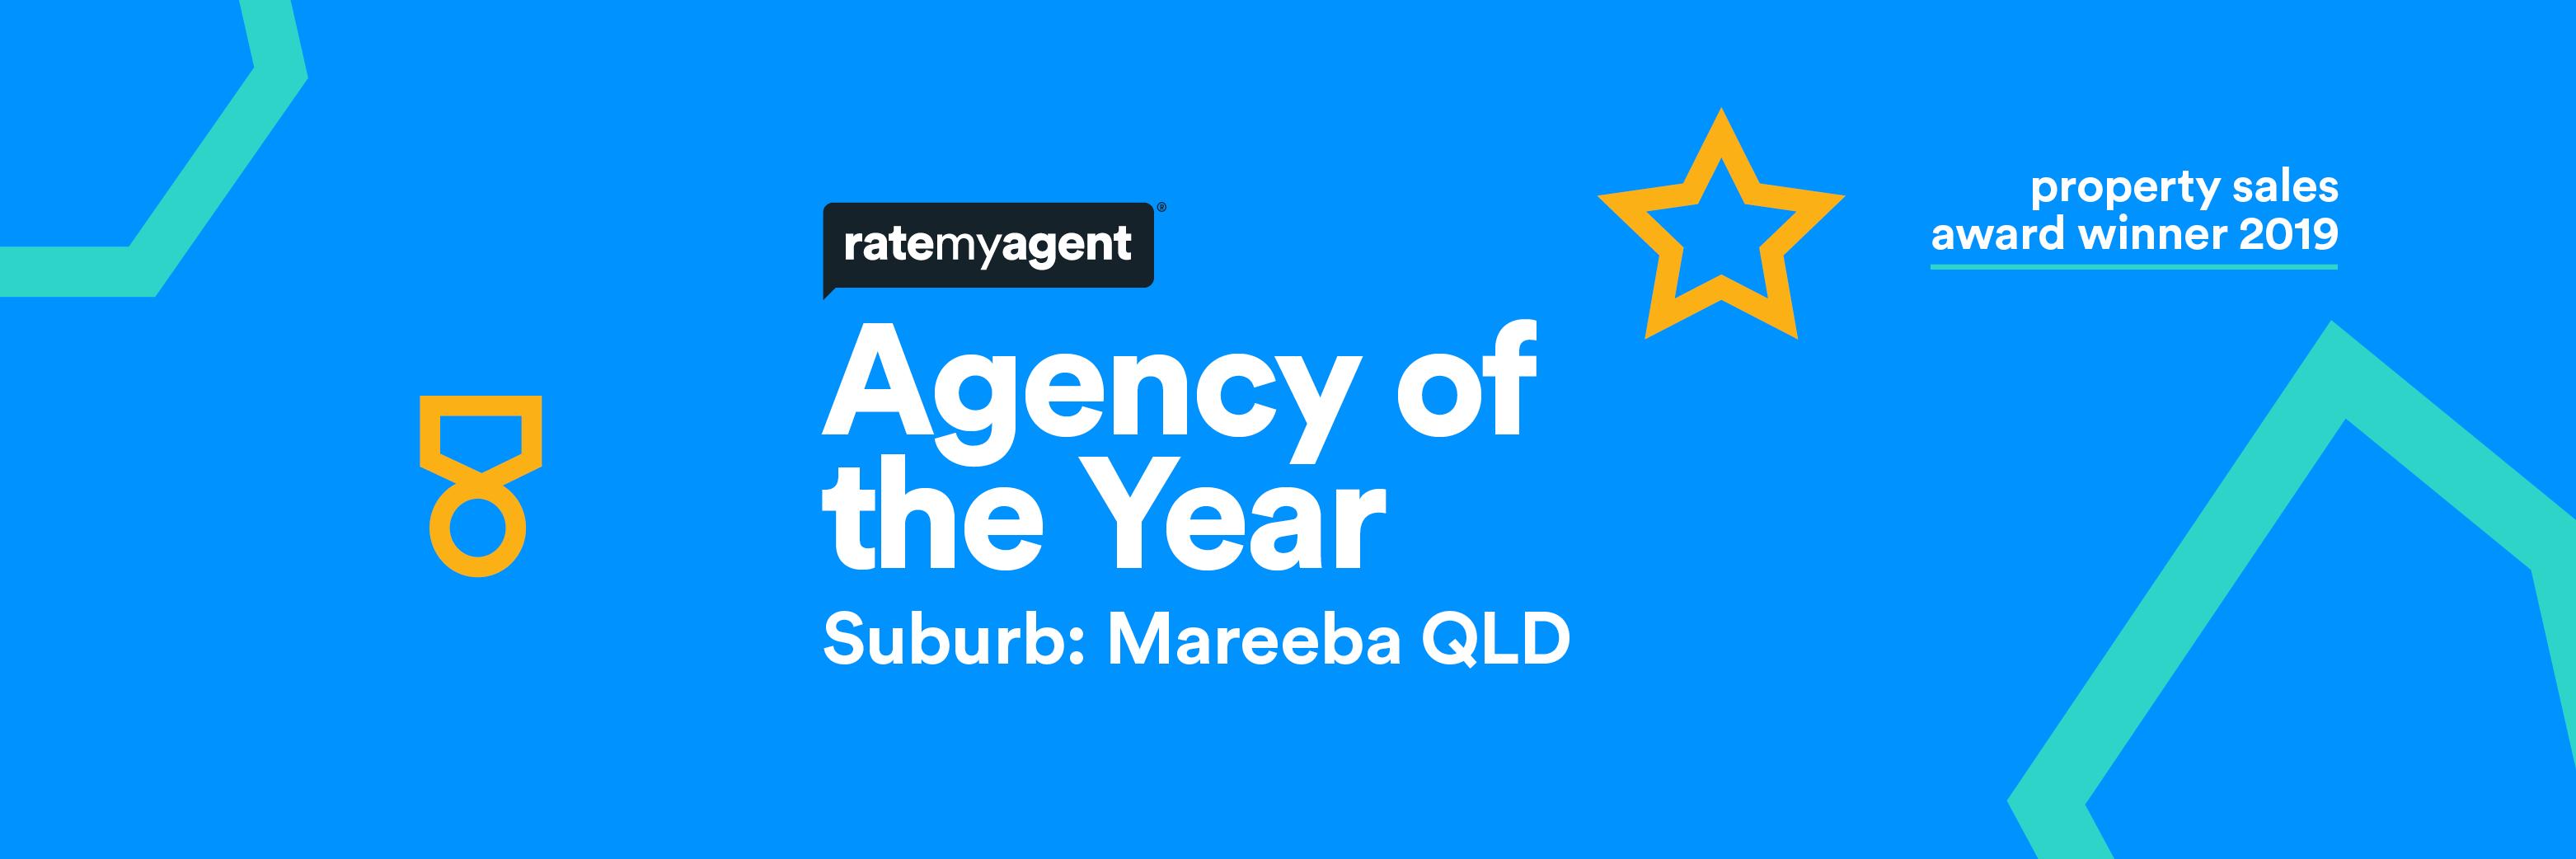 Winner Agency of the Year Award 2019